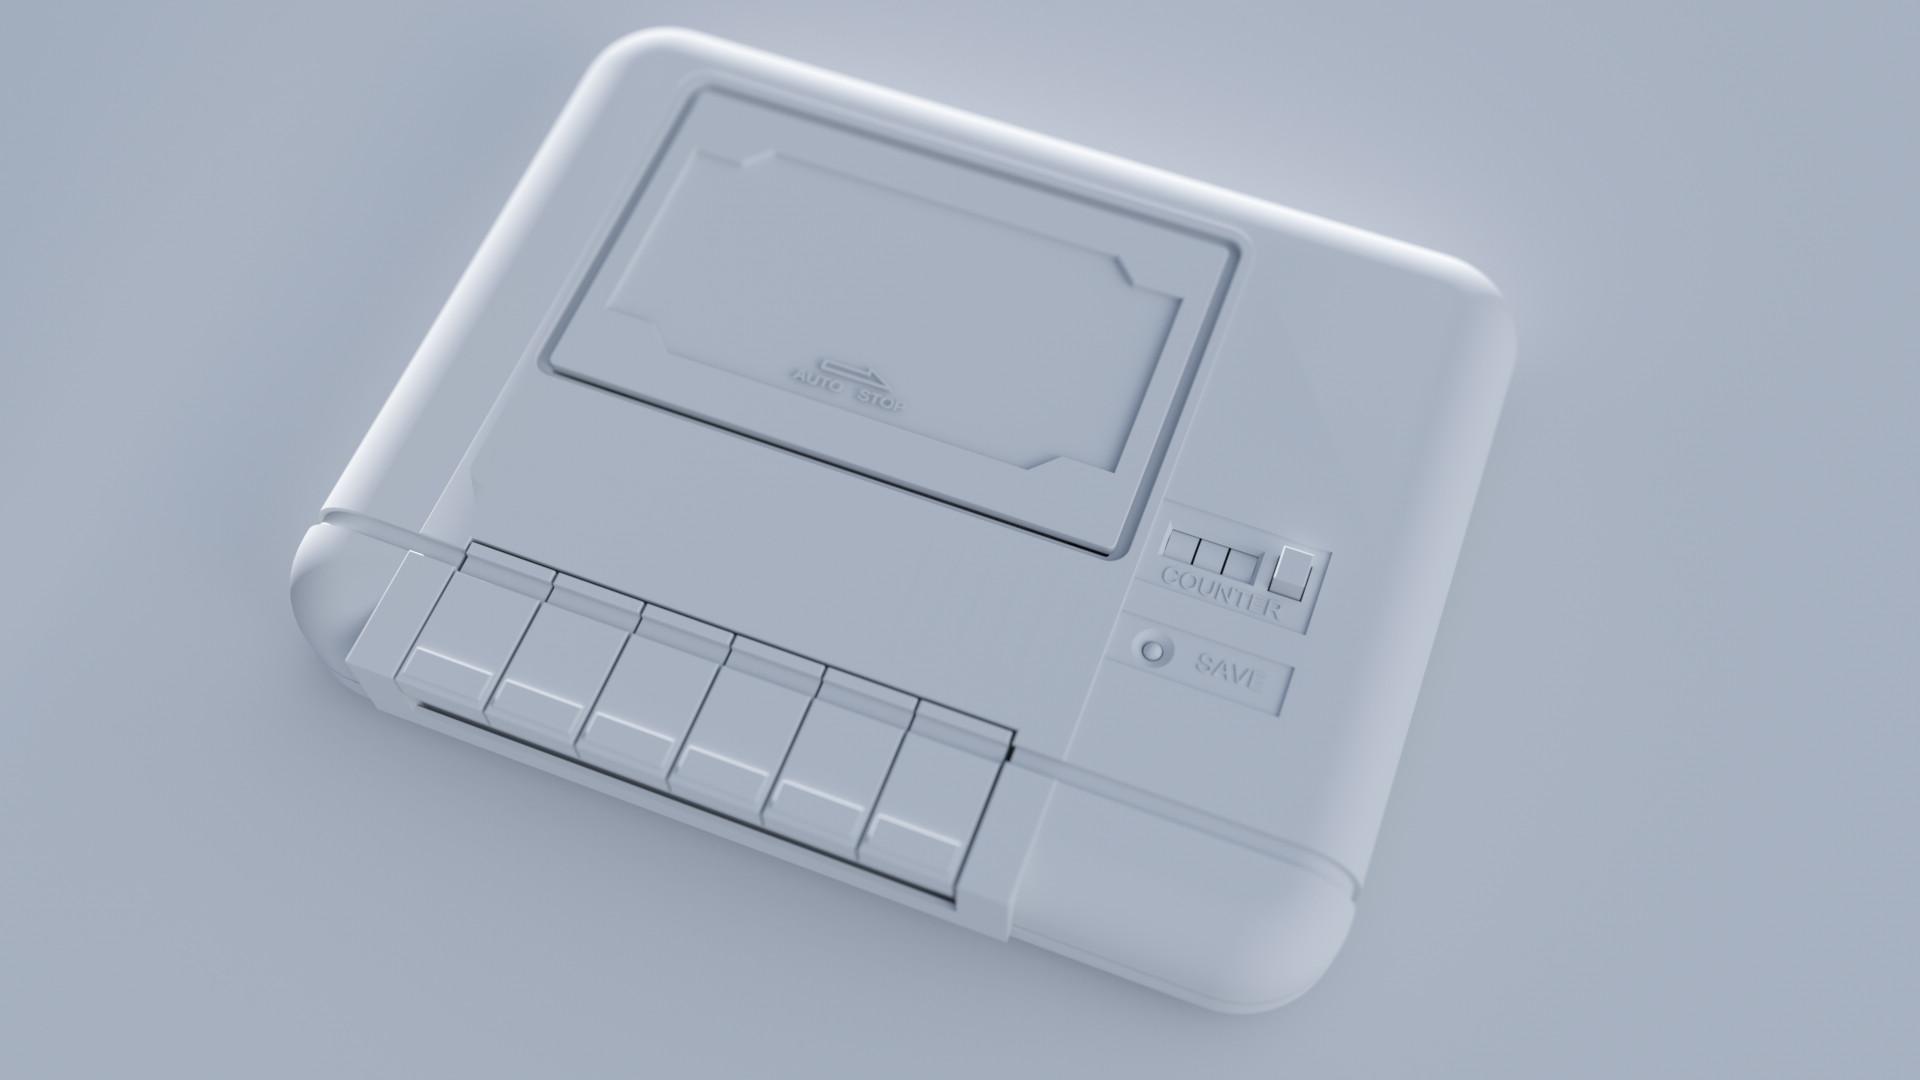 Michelangelo girardi cassette clay